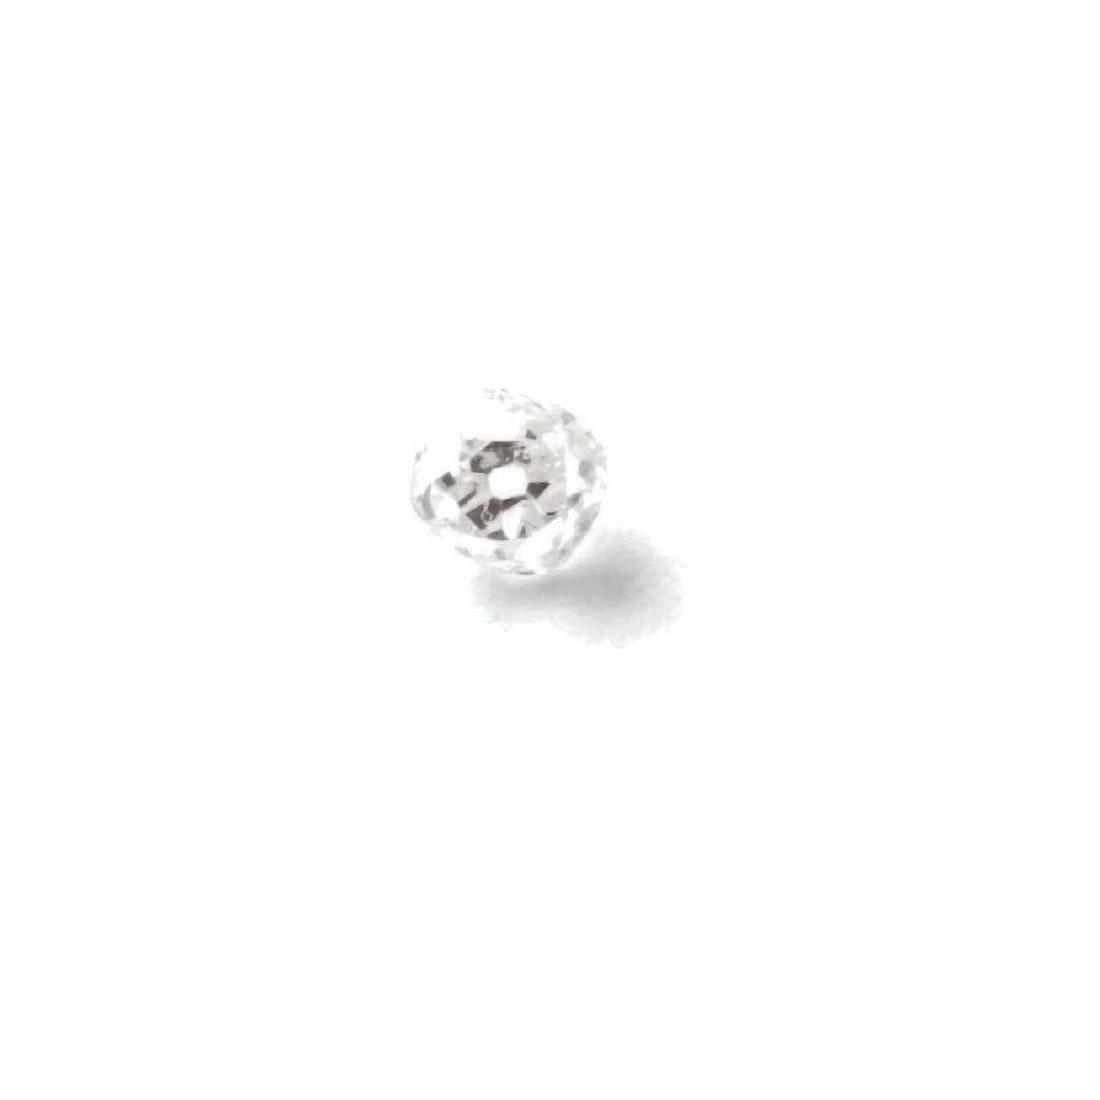 DIAMOND 0.36ct SI2